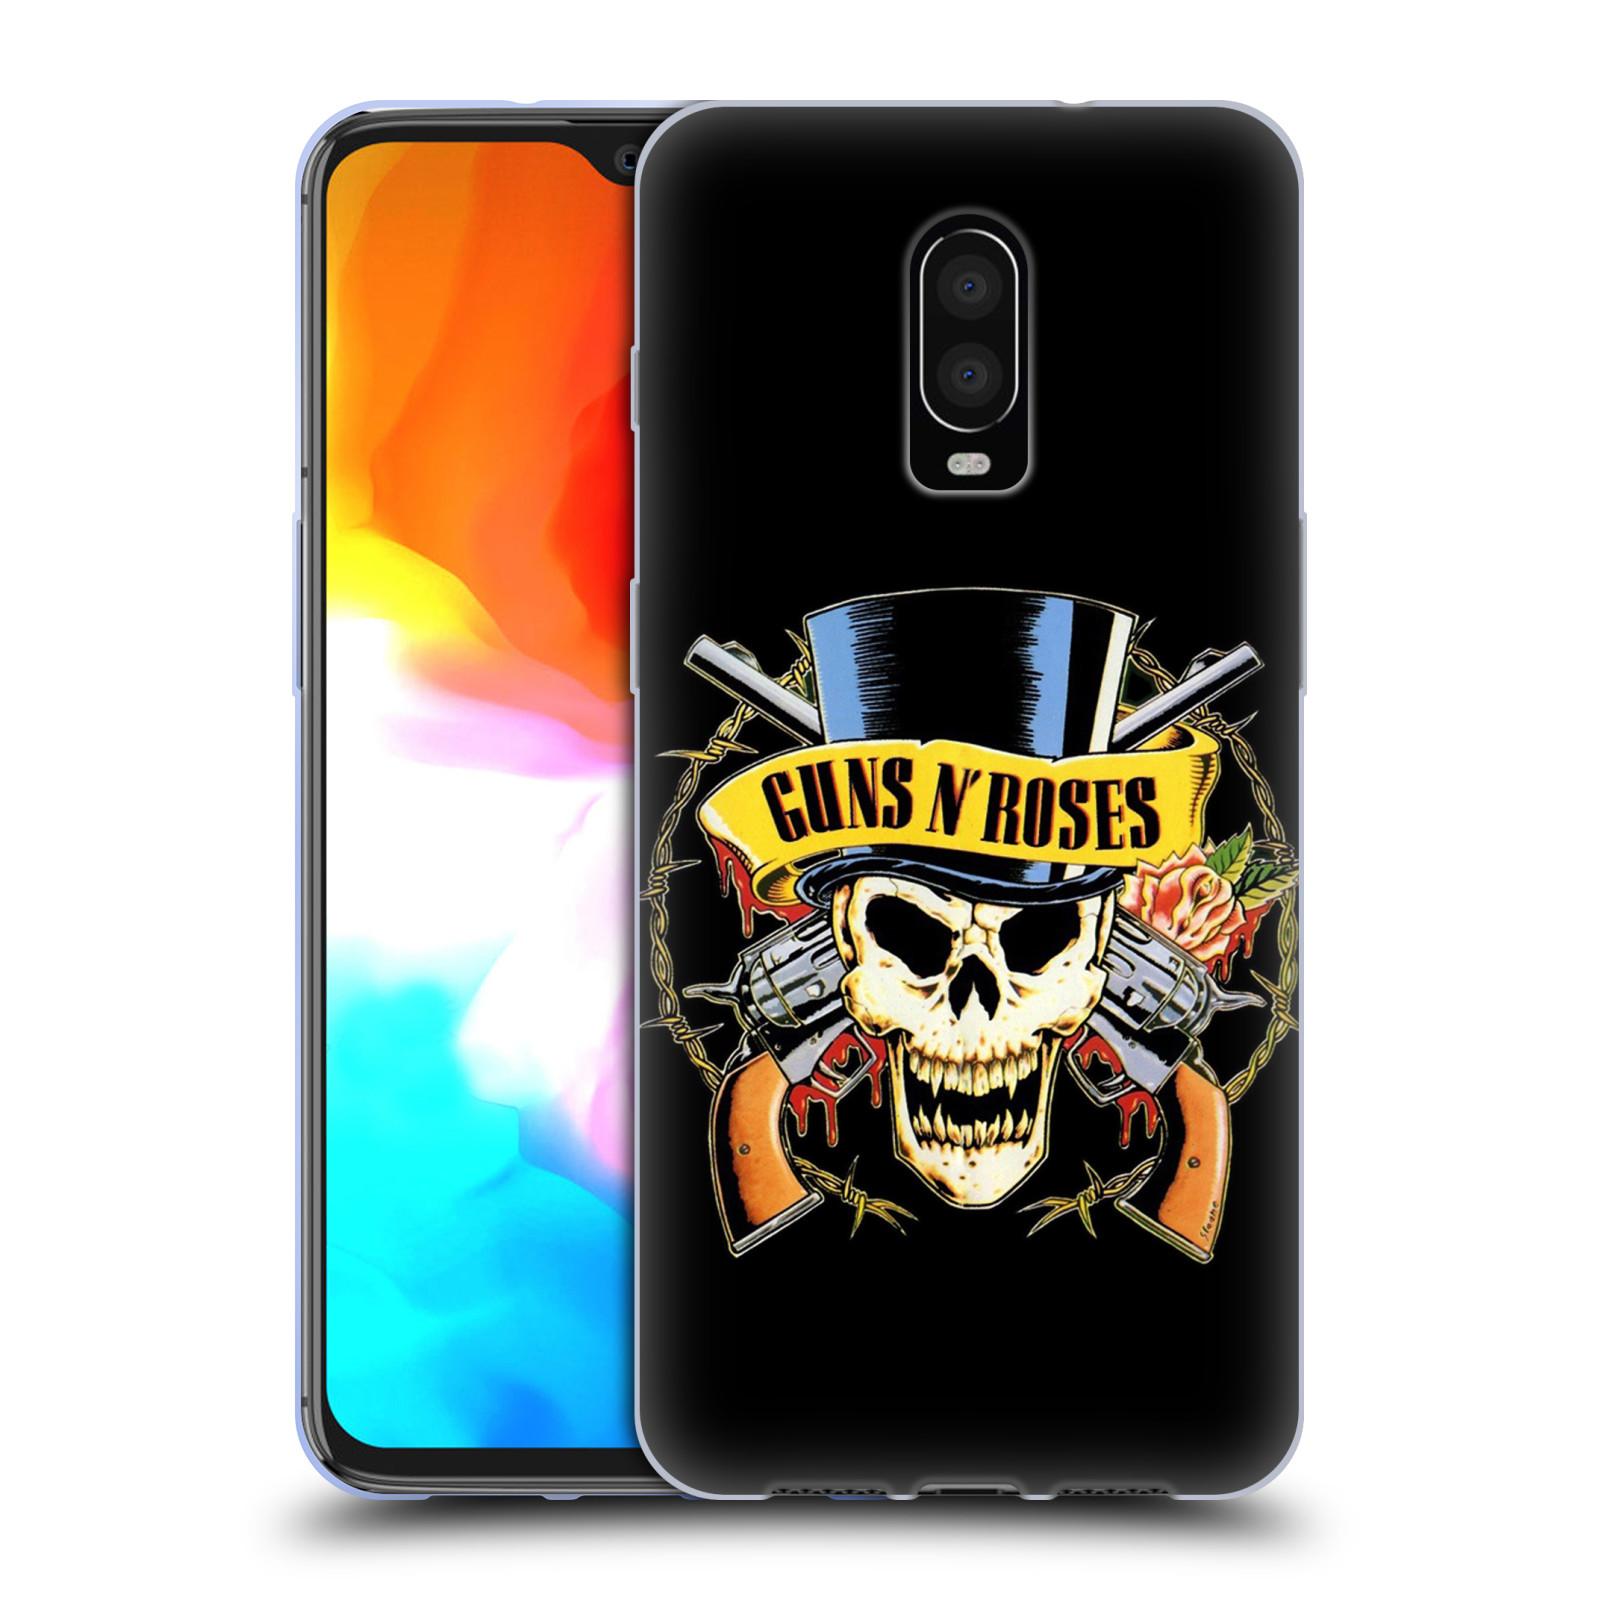 Silikonové pouzdro na mobil OnePlus 6T - Head Case - Guns N' Roses - Lebka